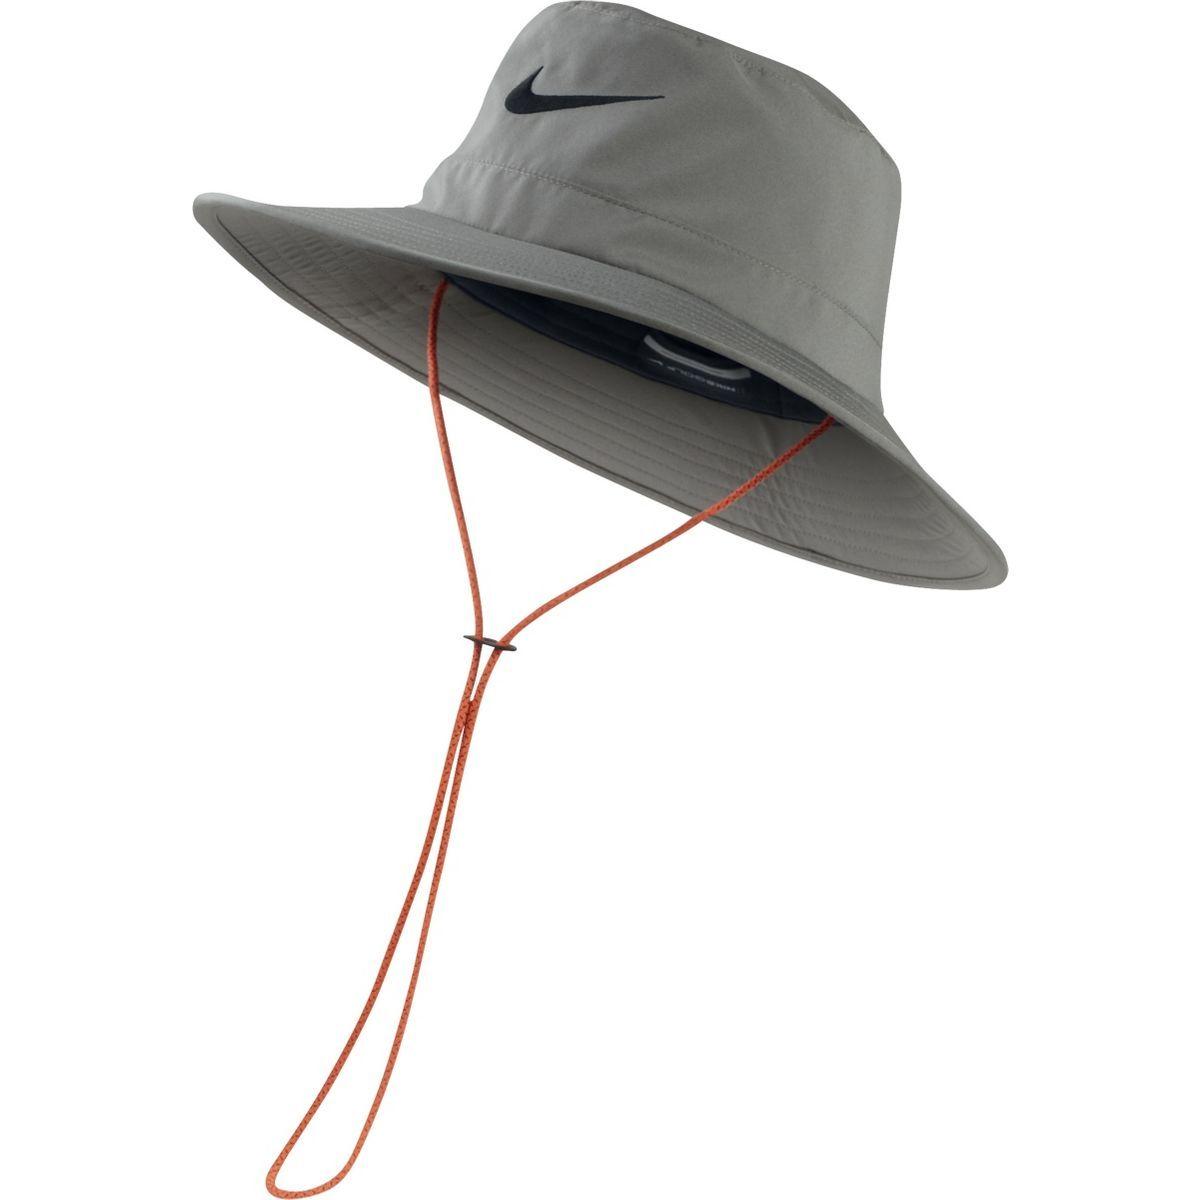 c3f6d55a49ef4 Nike Dri-FIT Men s Sun Bucket Golf Hat